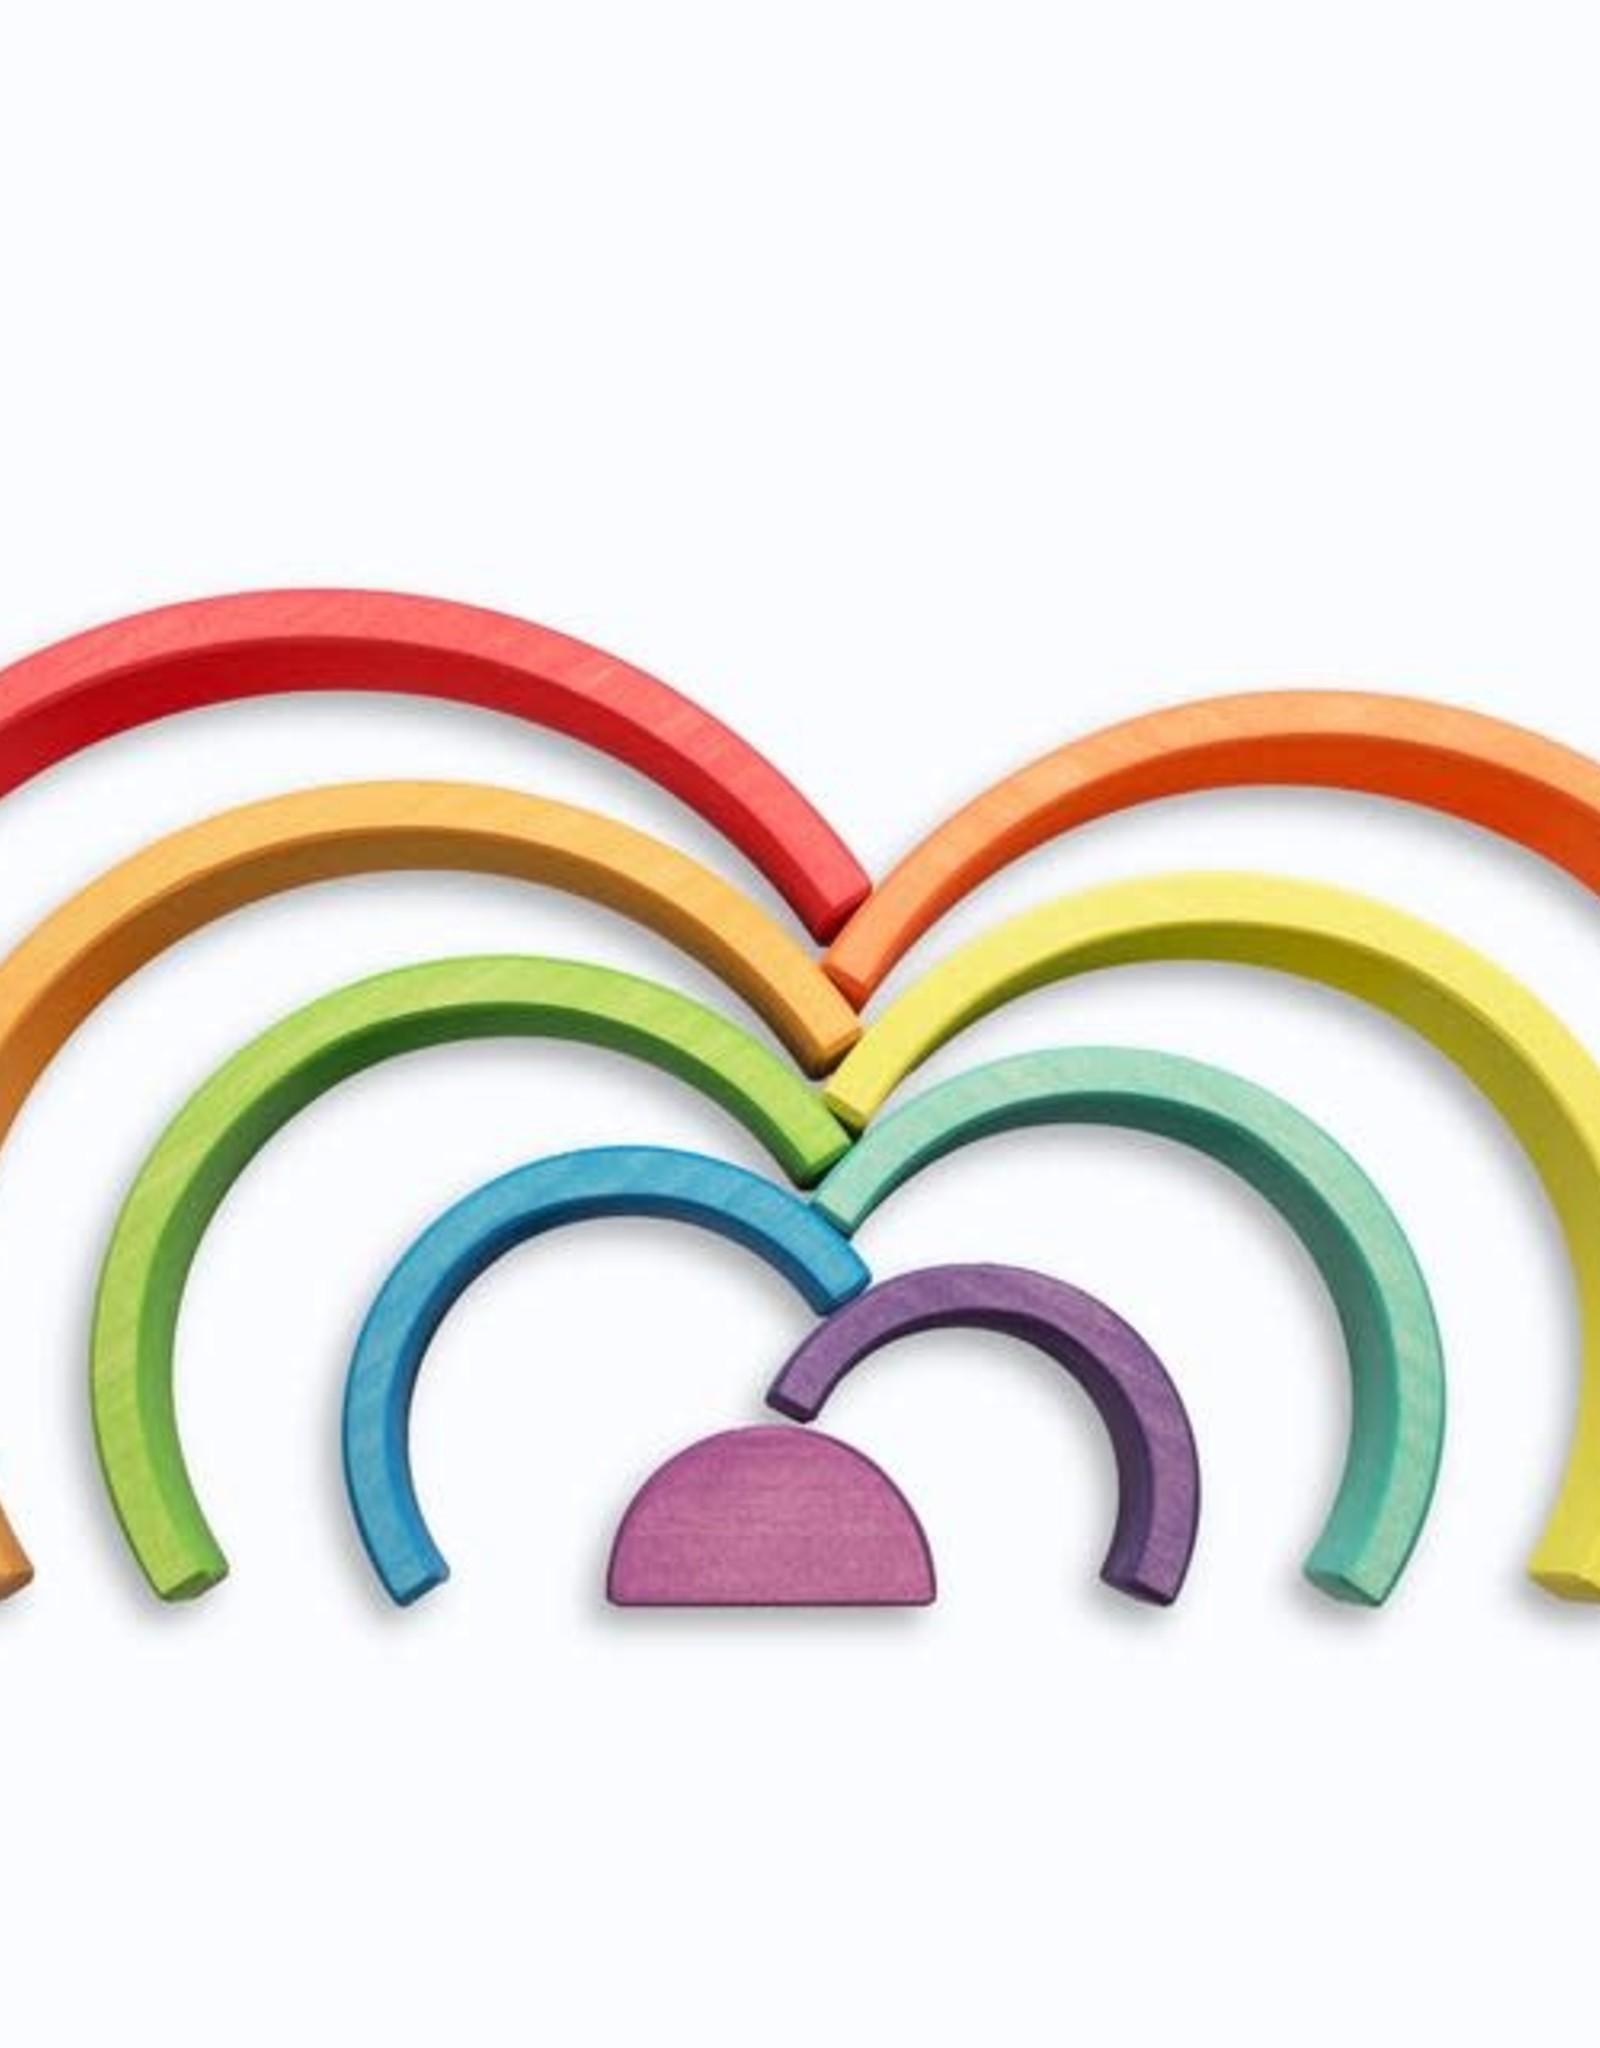 Ocamora 9 Piece Wooden Rainbow Stacker - Red